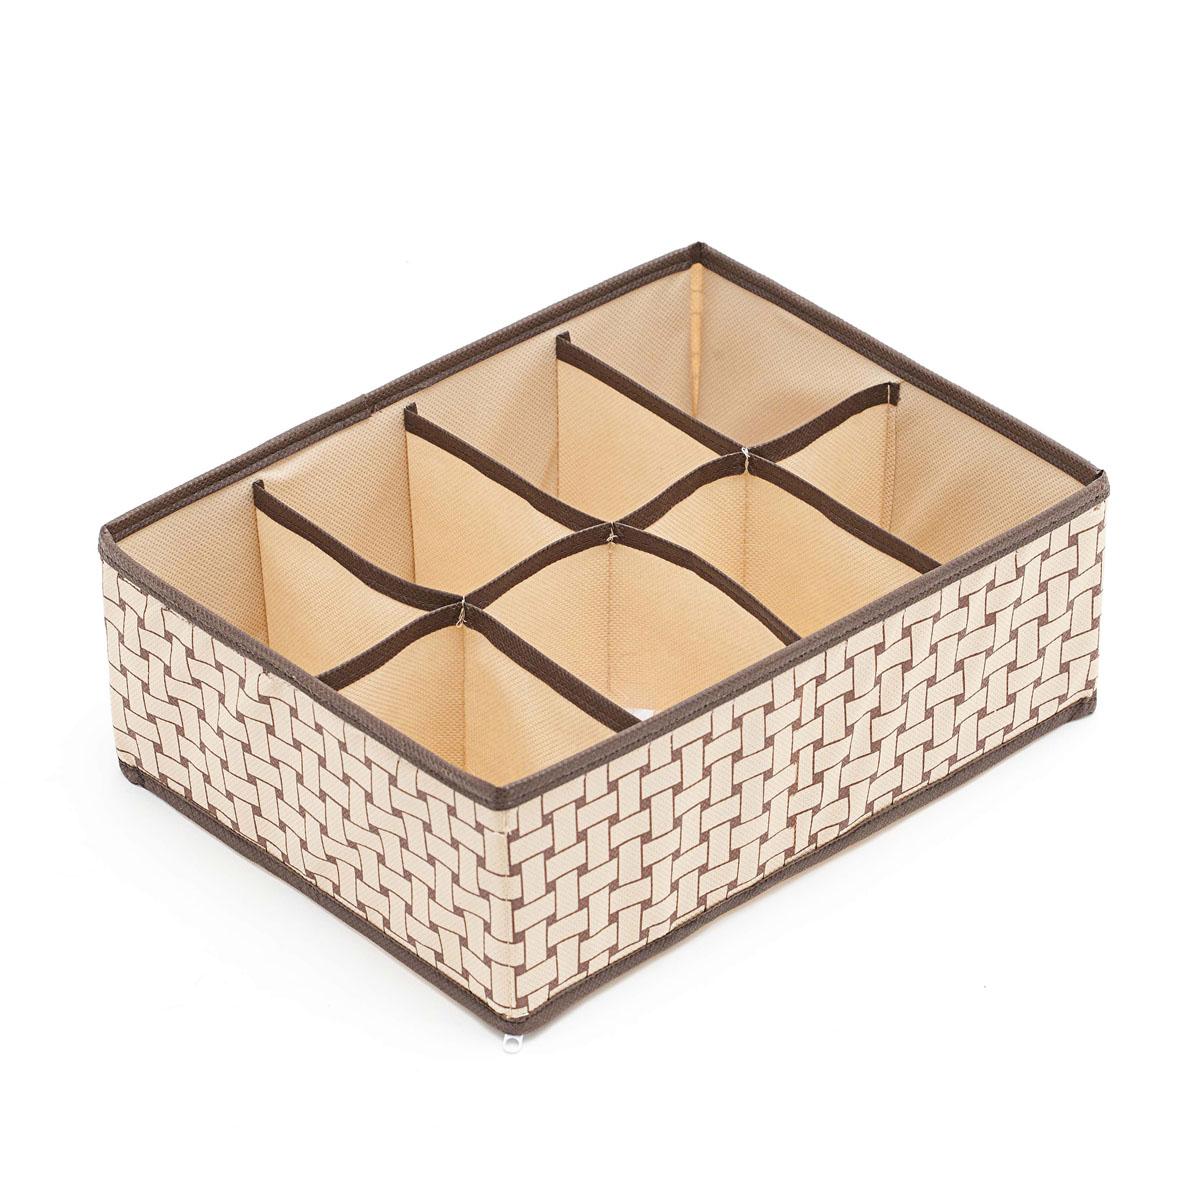 Органайзер для хранения вещей Homsu Pletenka, 8 секций, 31 х 24 х 11 см набор органайзеров homsu ностальгия с крышкой 31 х 24 х 11 см 3 шт